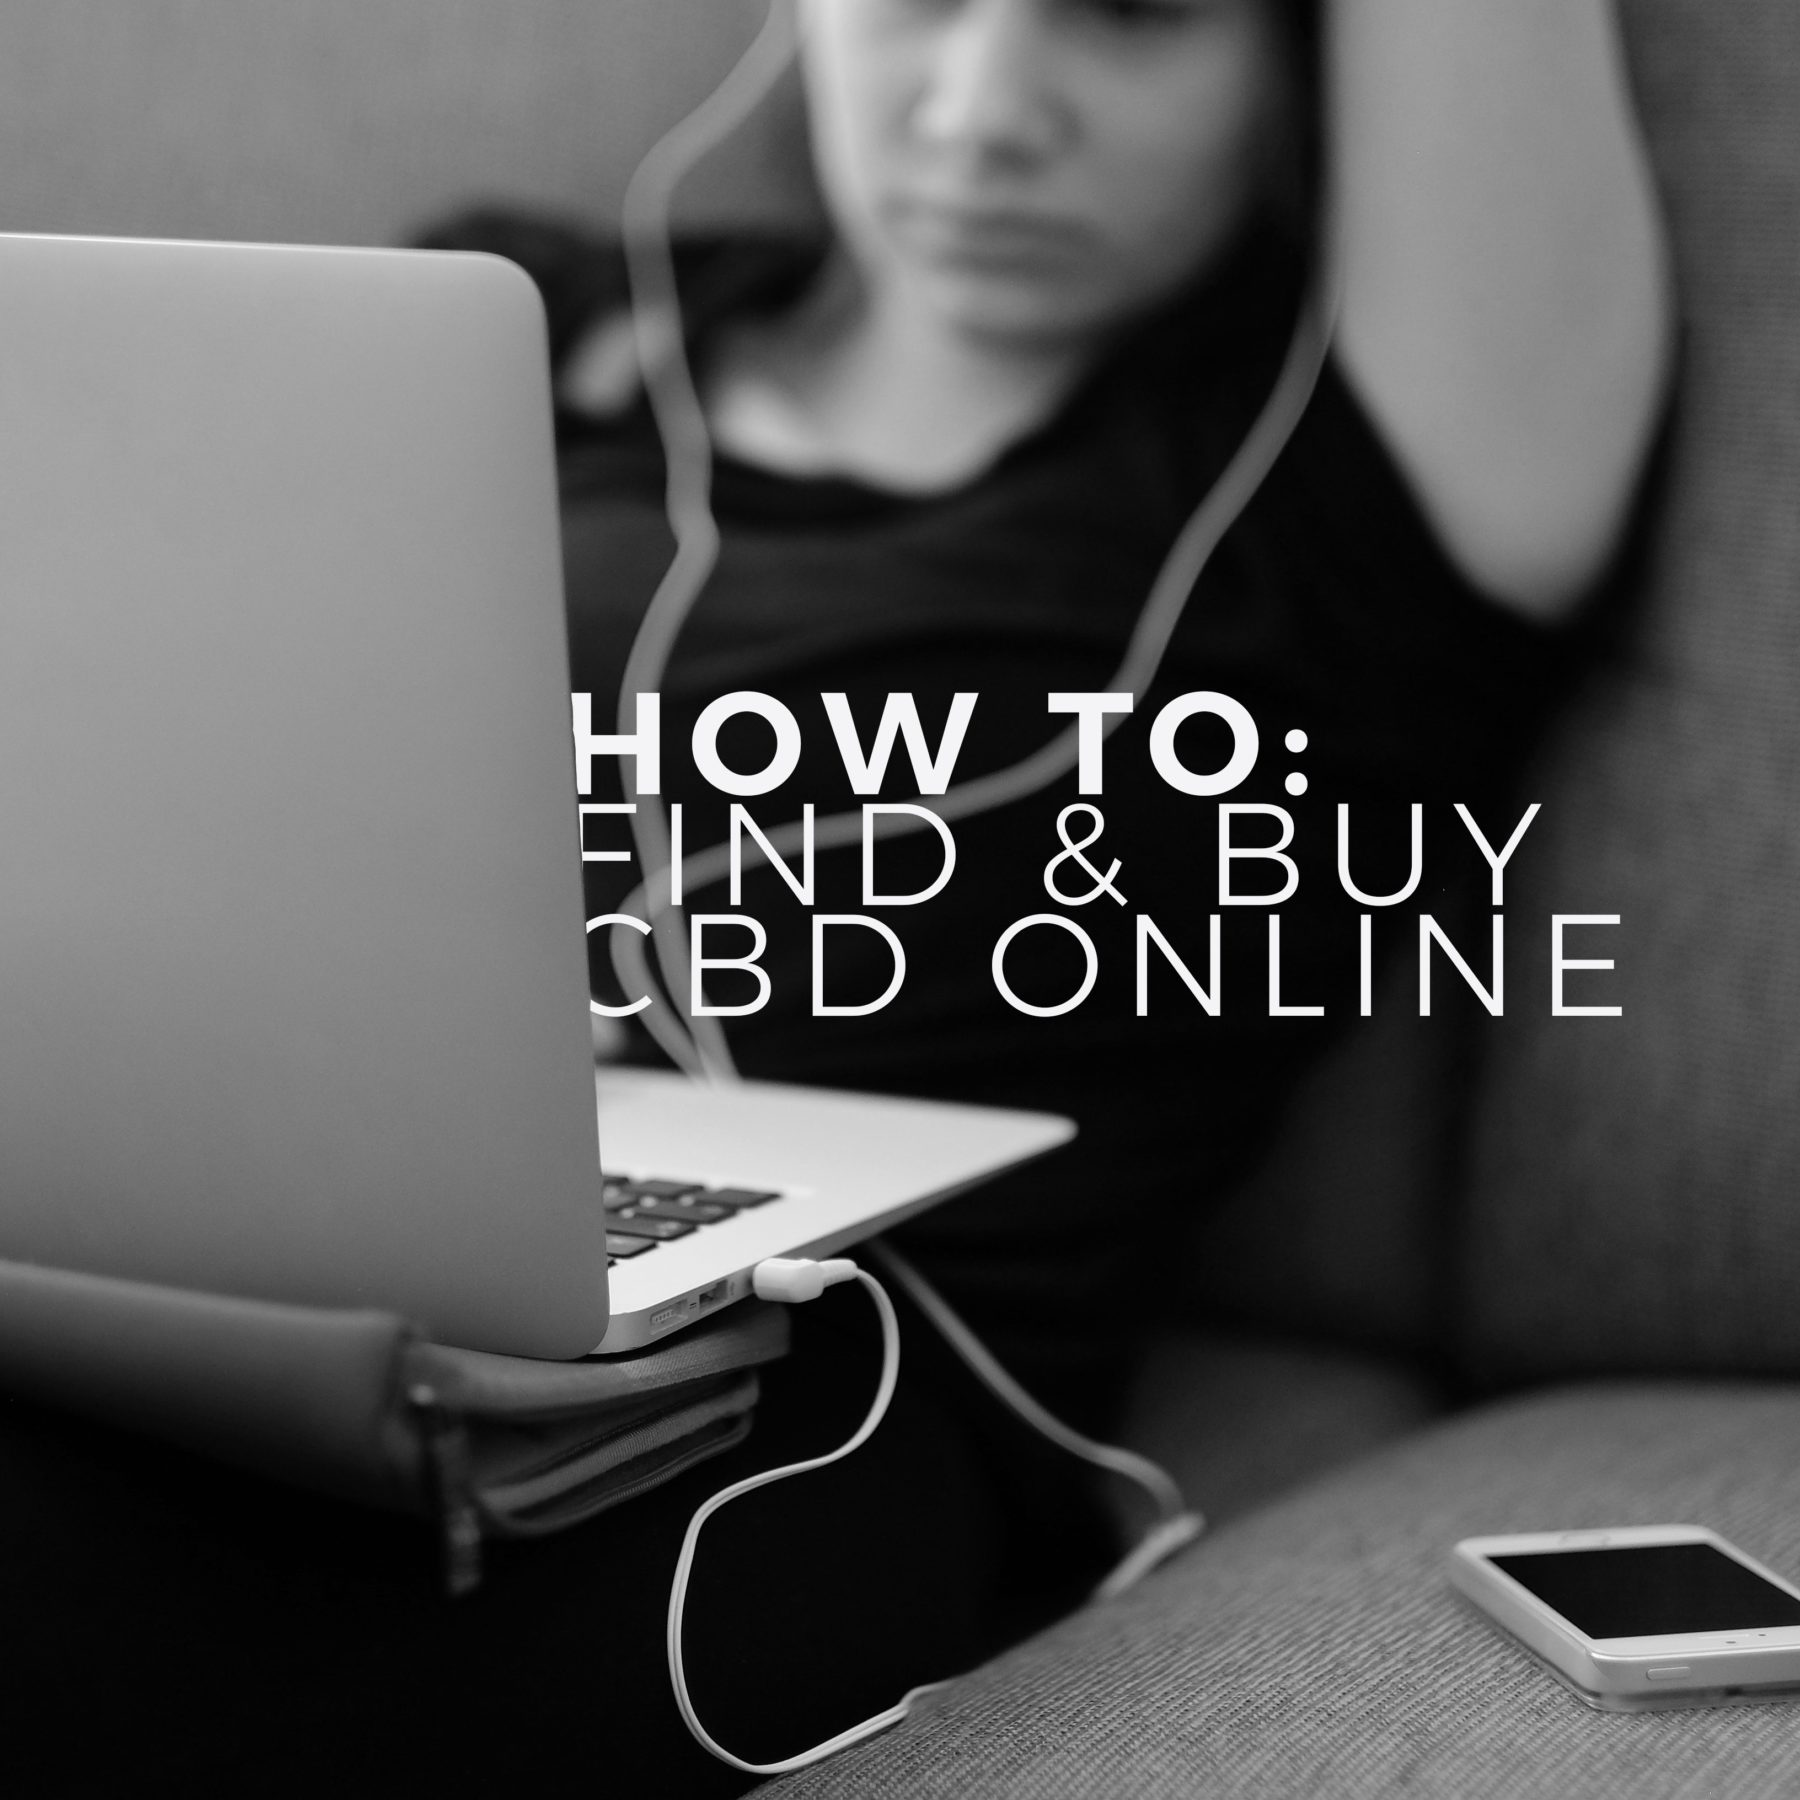 How To Buy CBD Oil Online